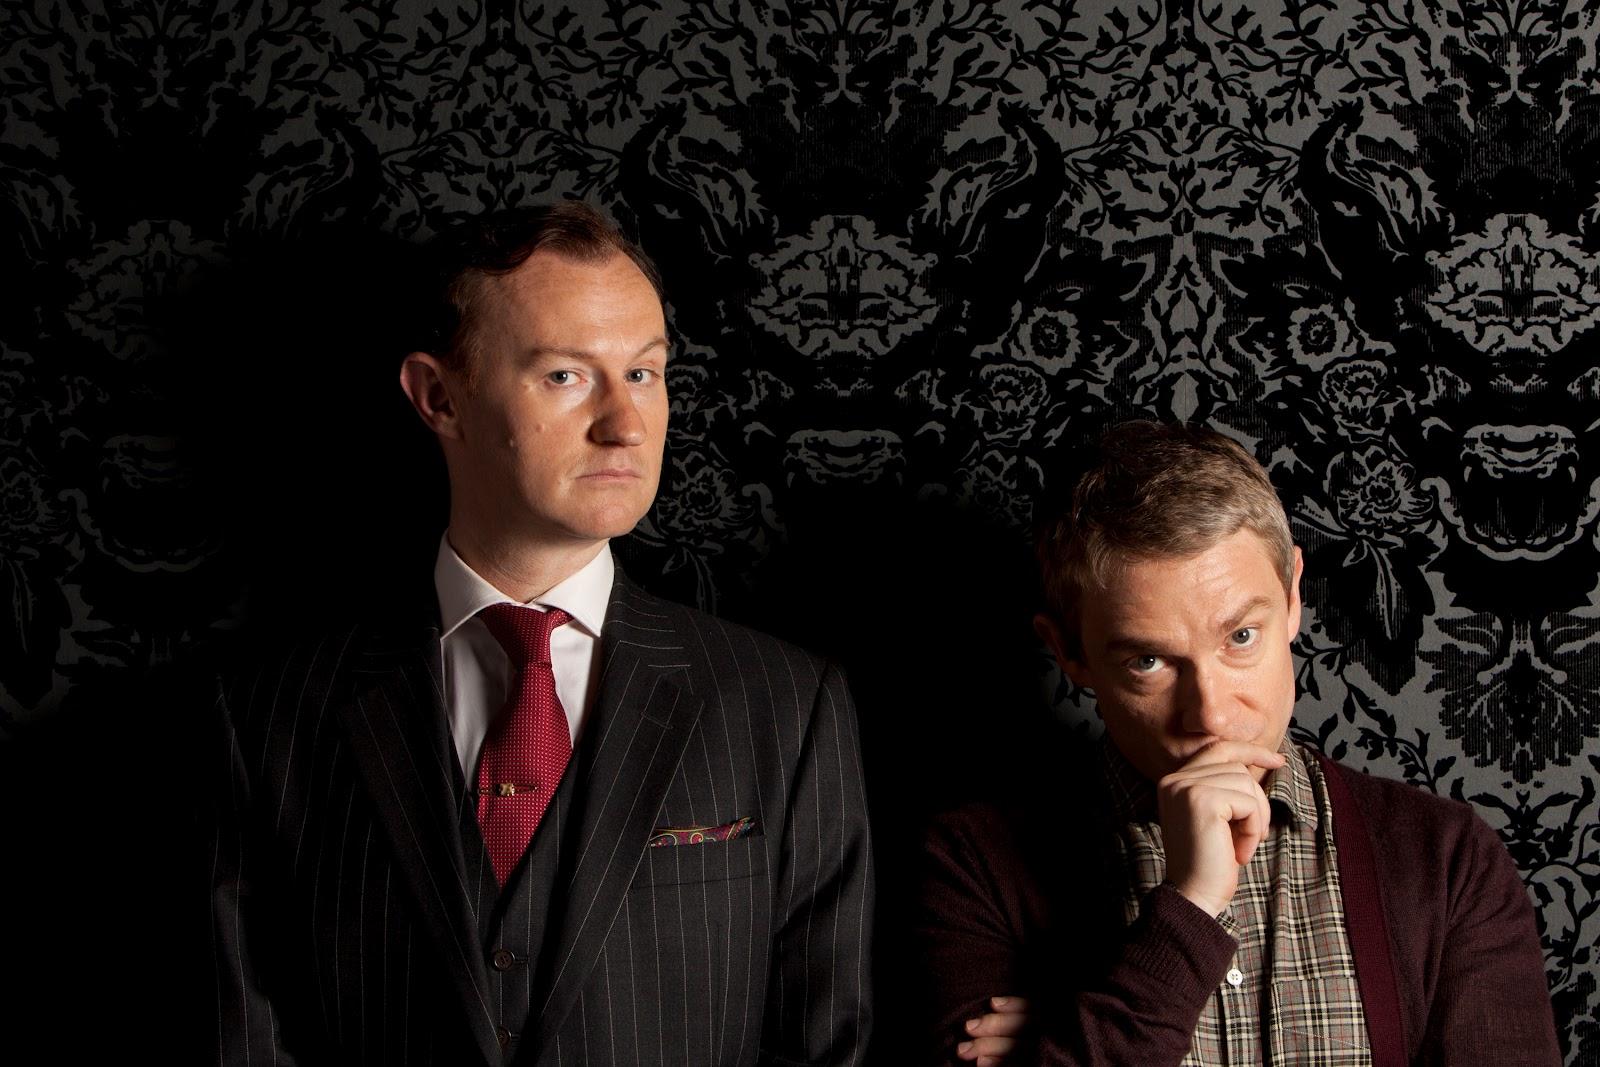 Sherlock holmes bbc download season 2 / Itachi death episode